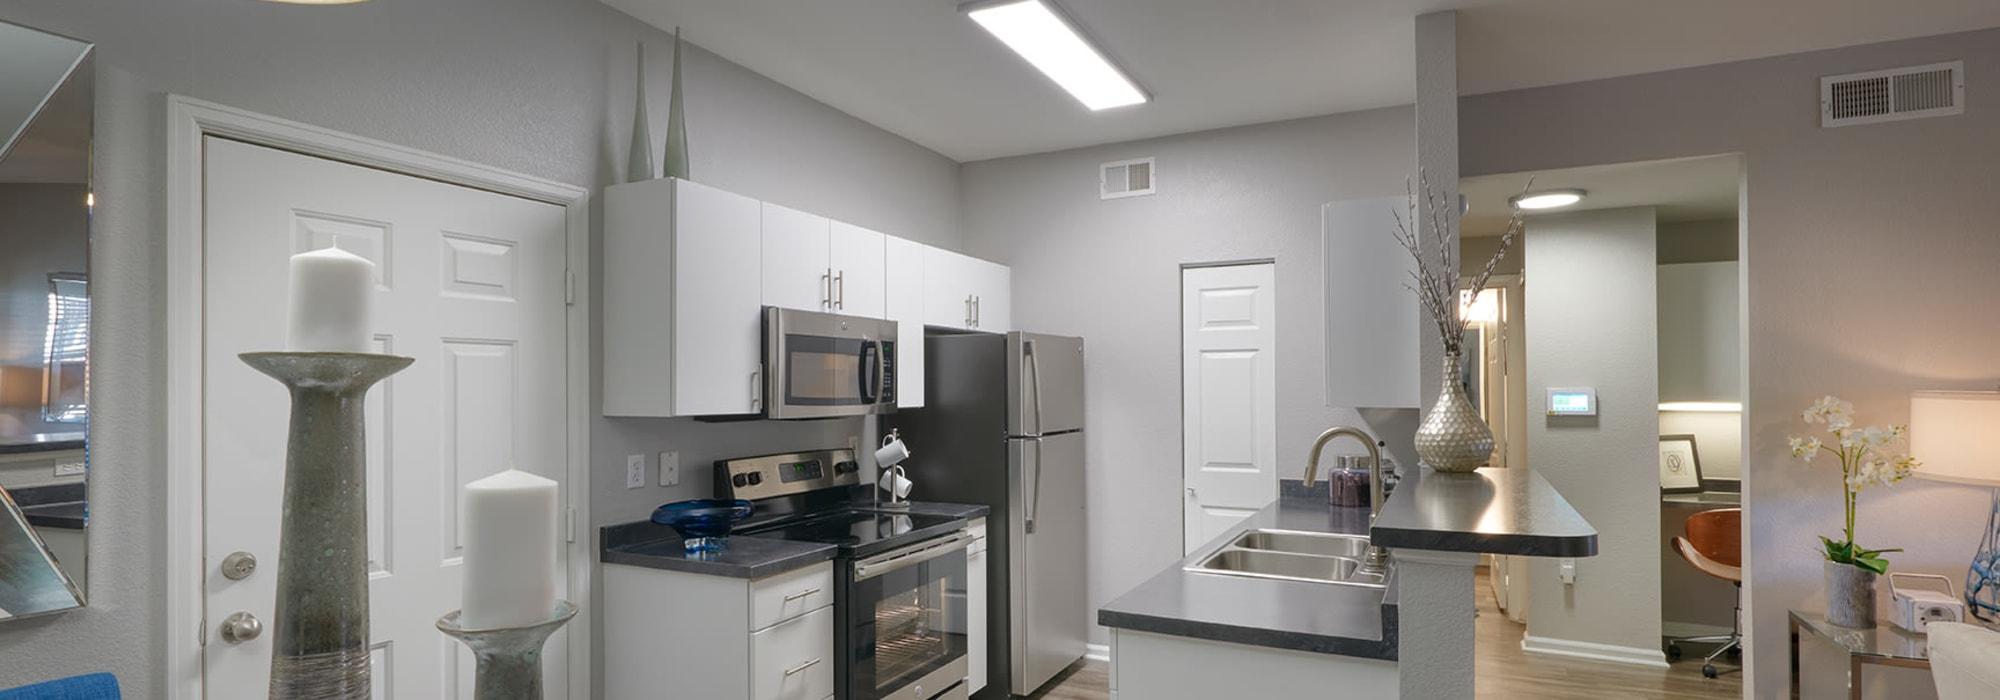 Contact us at Crestone Apartments in Aurora, Colorado